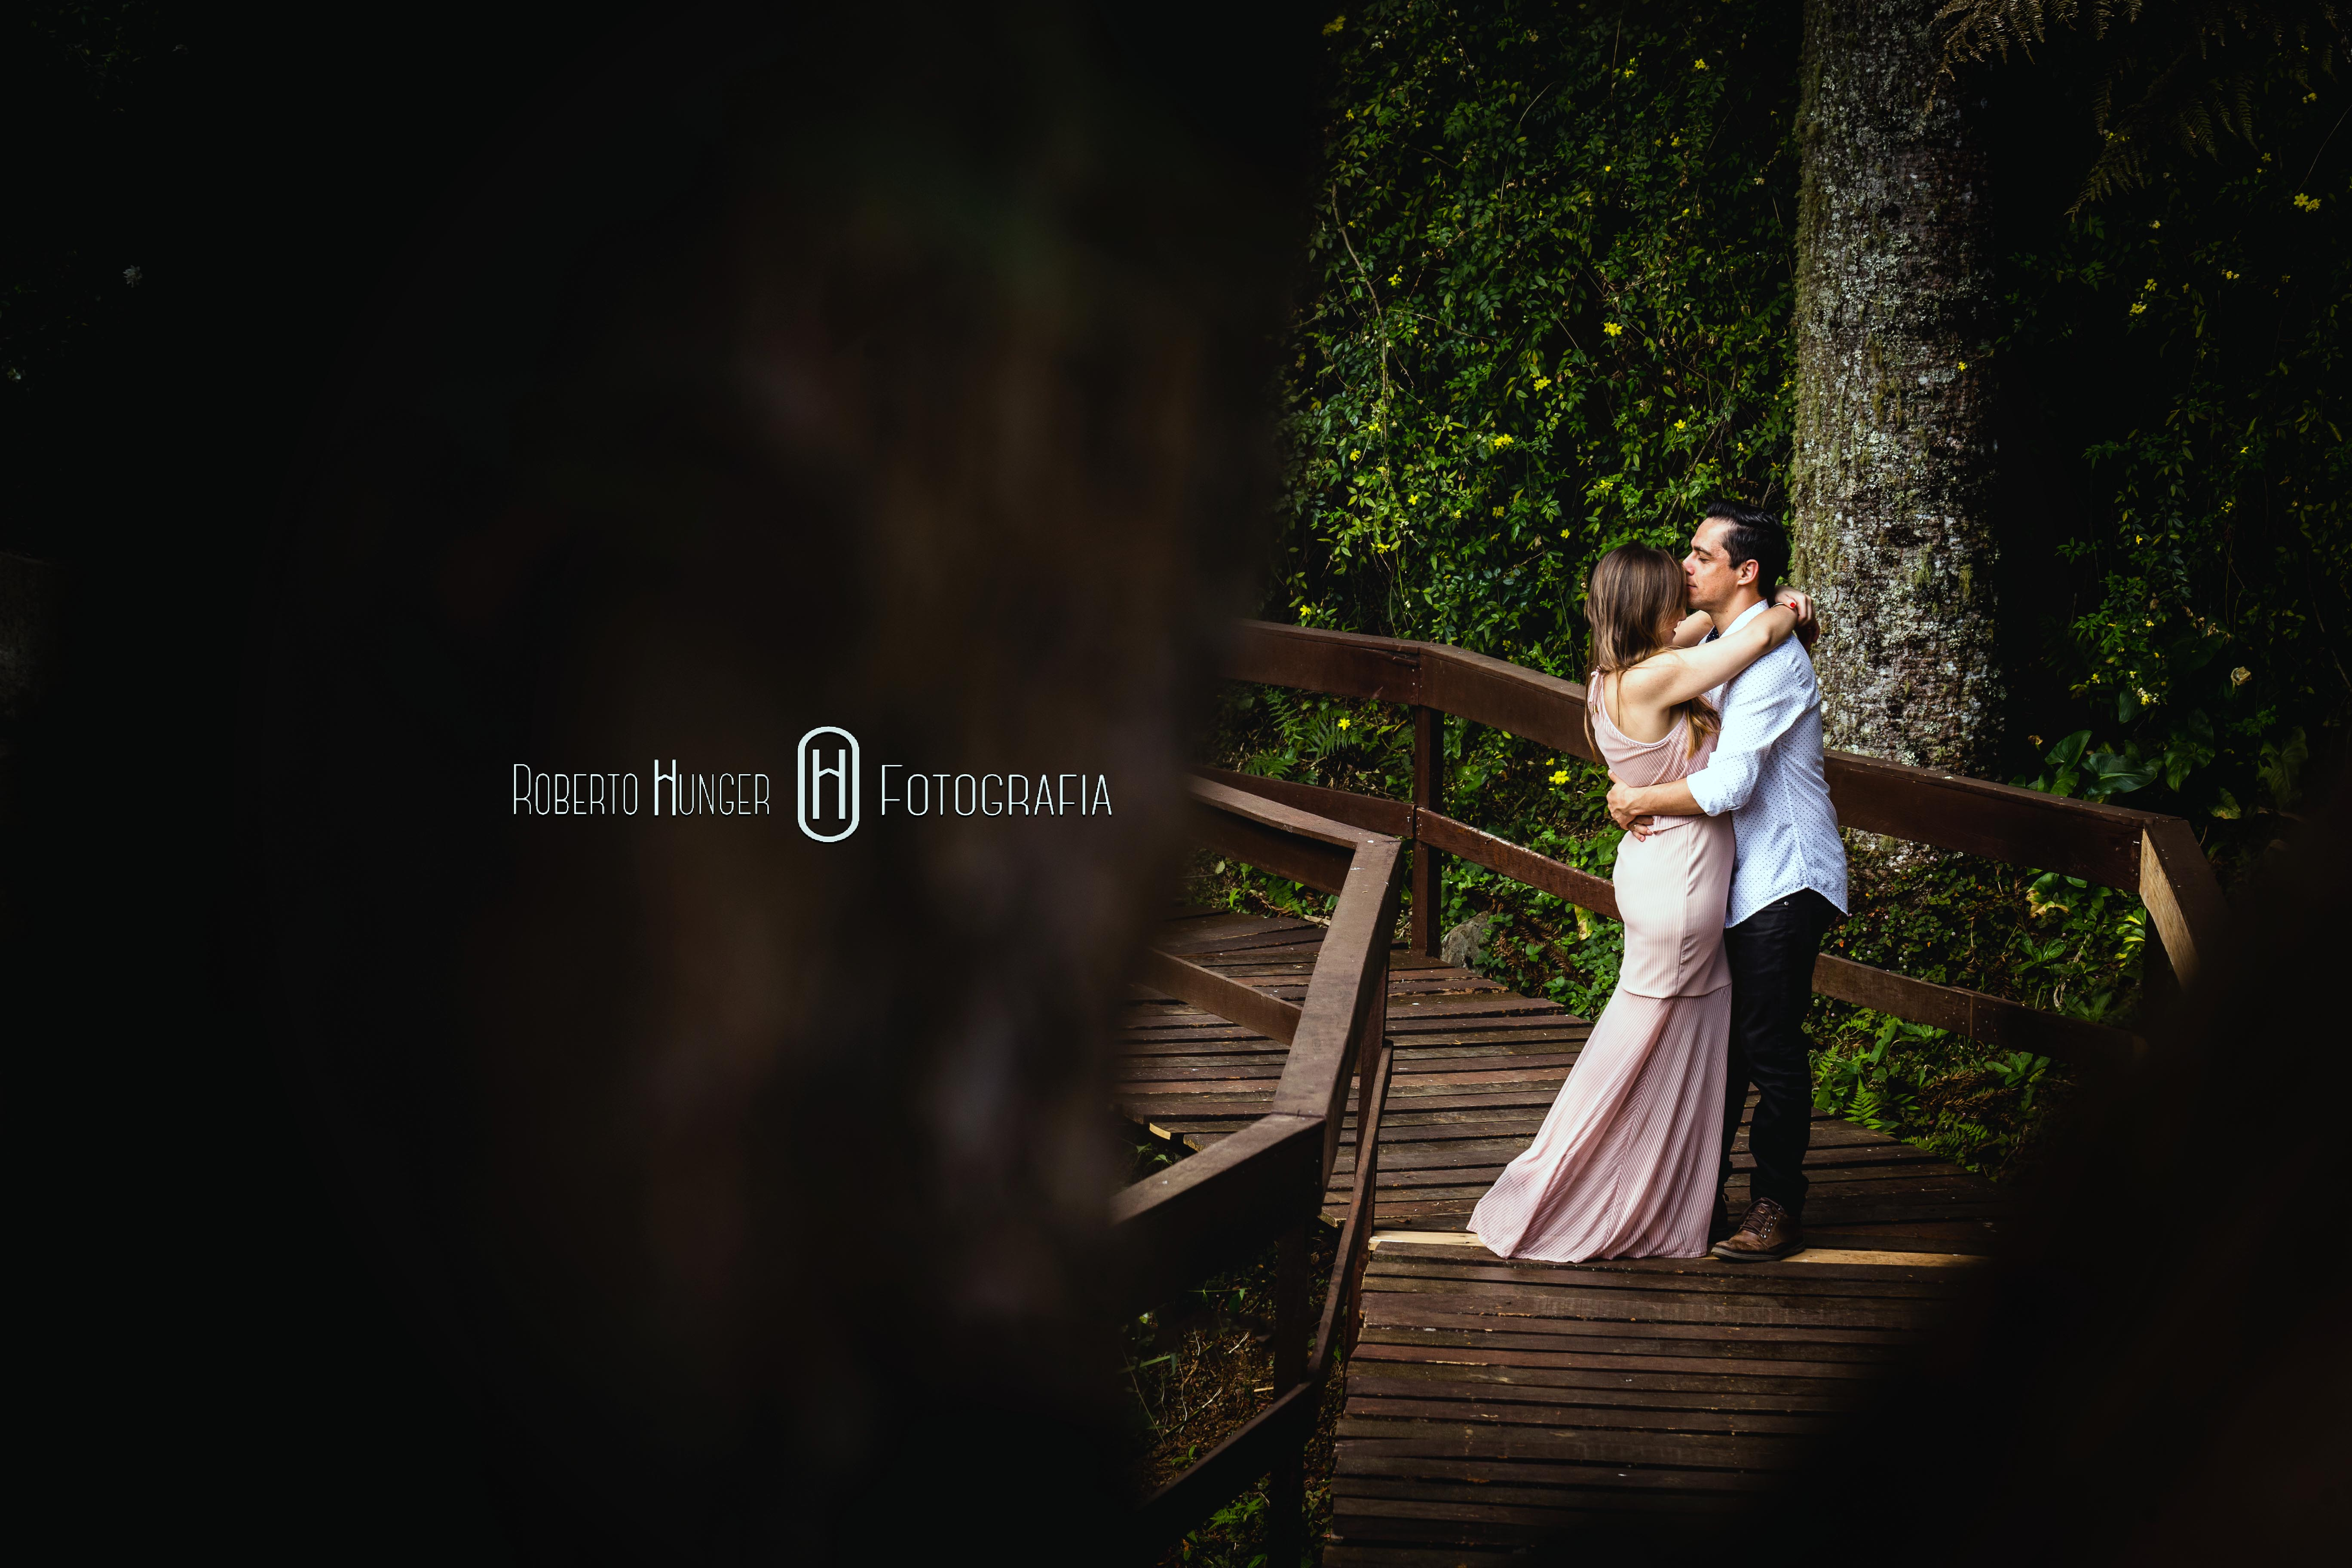 Ensaio Débora e Wesley, #noivas2021, #machado , #camanducaia , #casandonocampo, #bordadamata , #paraisopolis , #santaritadosapucai , #extremamg , #jacutinga, #andradas, #santaritadosapucai, #monteverde , #poçosdecaldas , #itajubá , #cambui , #cambuimg , #pousoalegre , #pirangucu , #itajuba , #casamento #noiva #noivos #casamentos #voucasar #noivaspousoalegre @deb_vargas @wesleysaa #elopementwedding #elopementweddingphotographer #elopementweddings